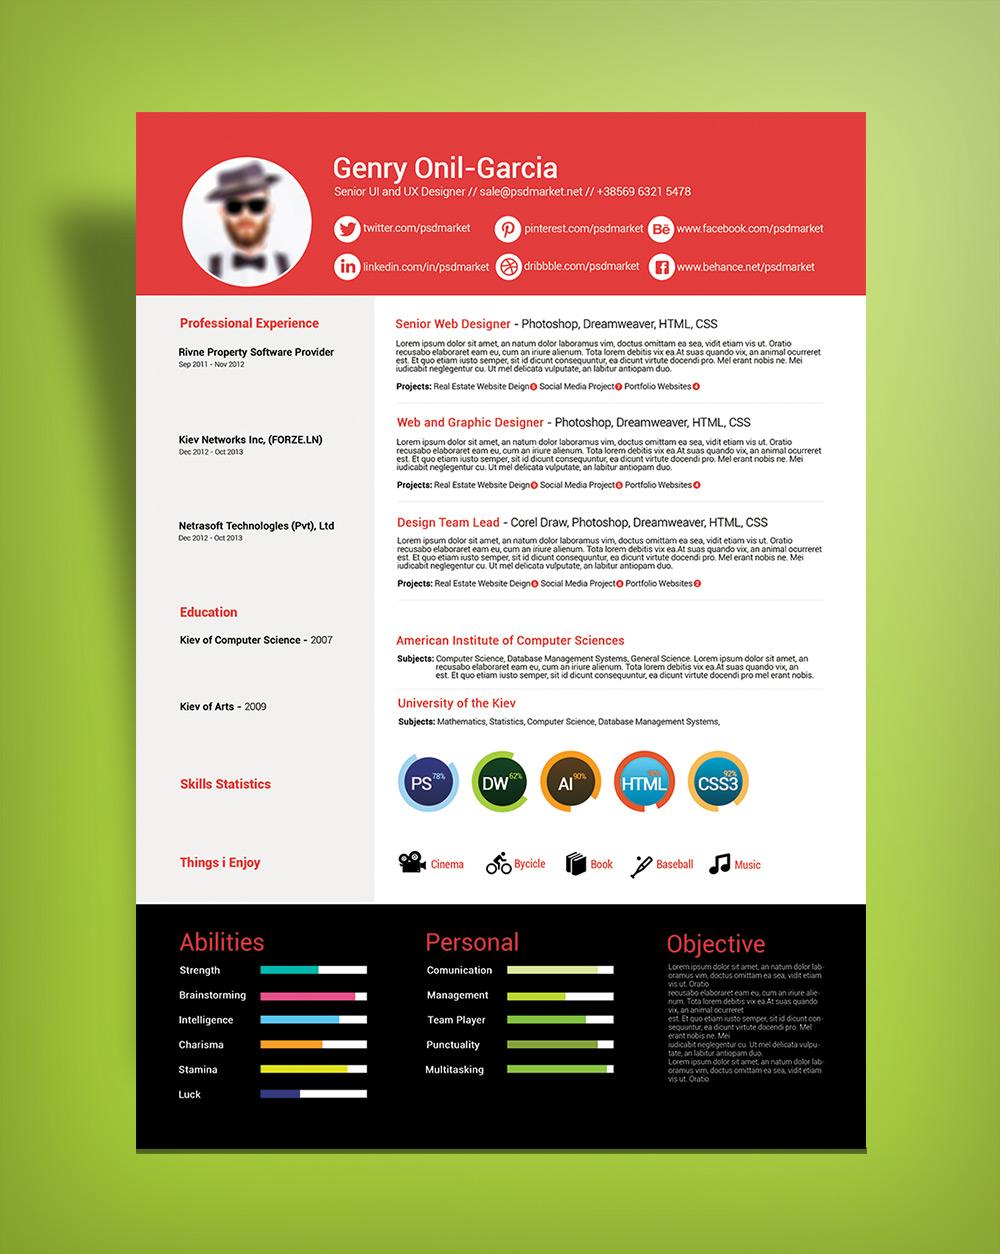 Free Simple Resume Design Template For UI & UX Desingers-Good Resume For Good Job (1)